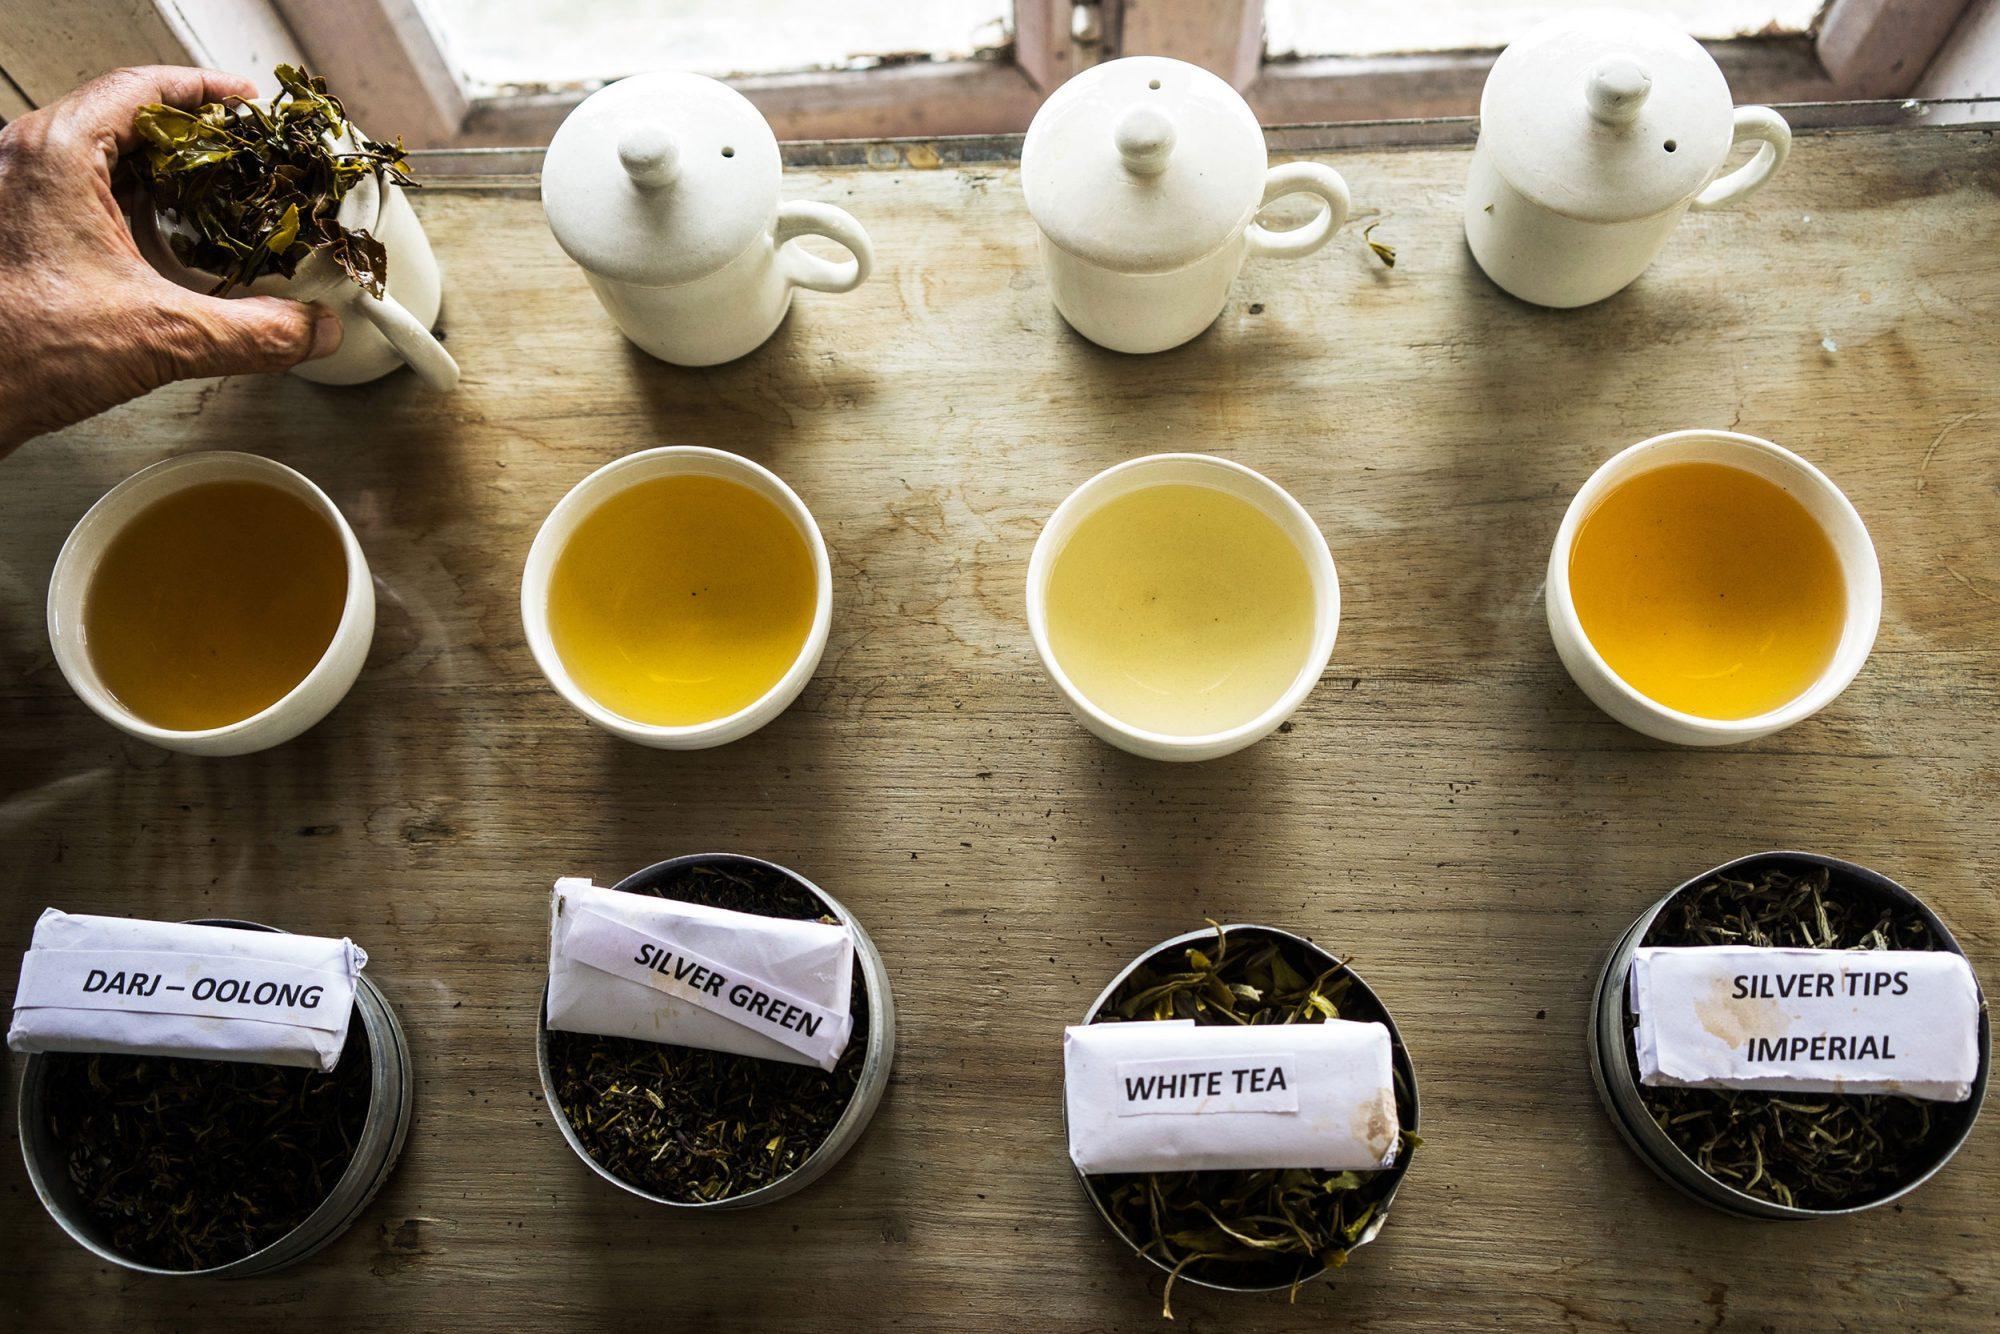 EC: 7 Tea Shops That Will Convert Even the Most Hardcore Coffee Snob